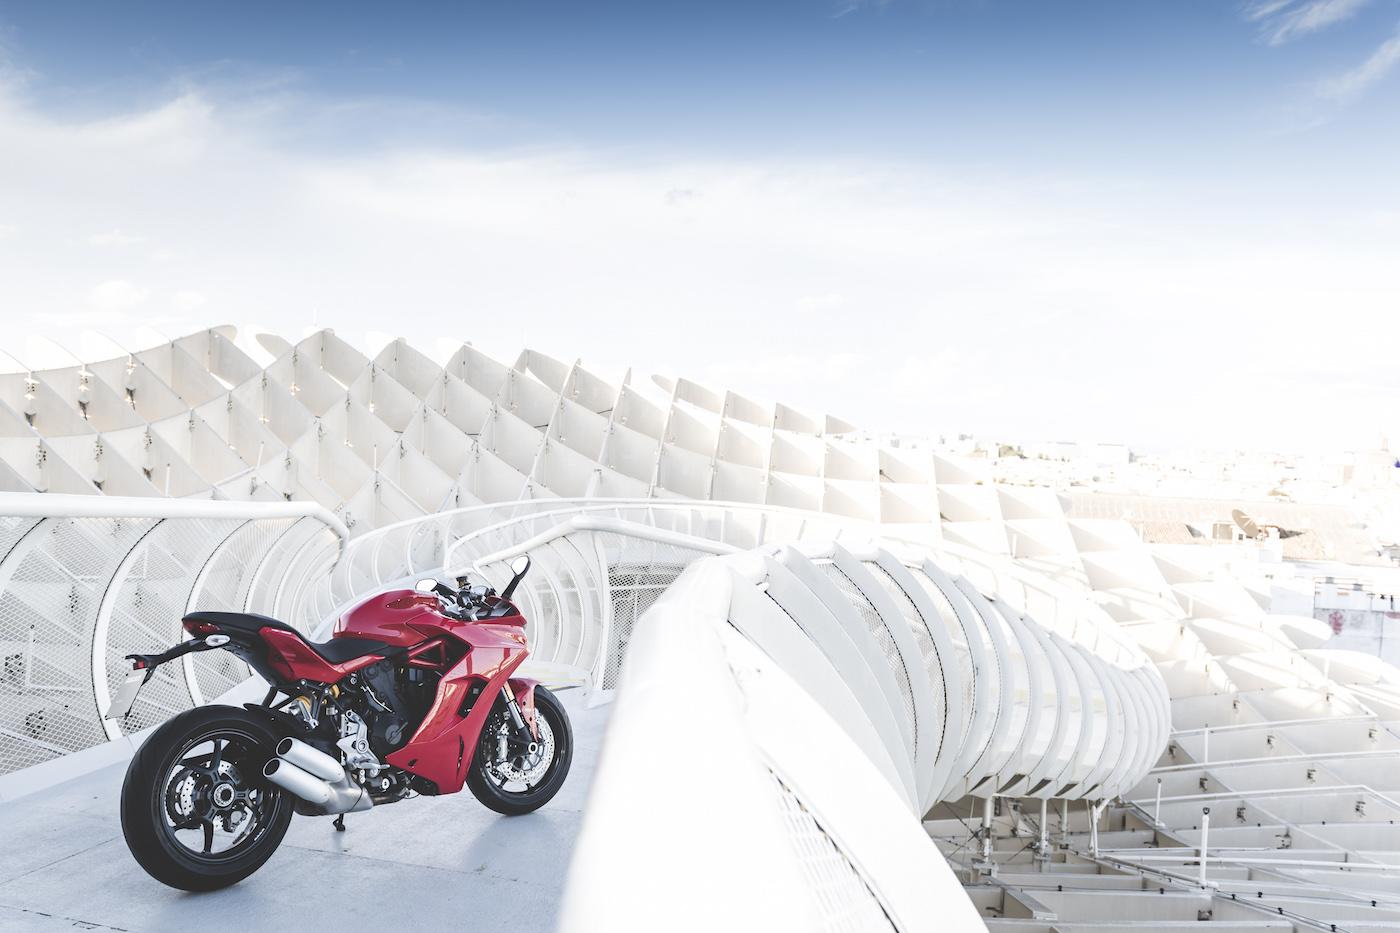 Ducati_Supersport_smallstatic1